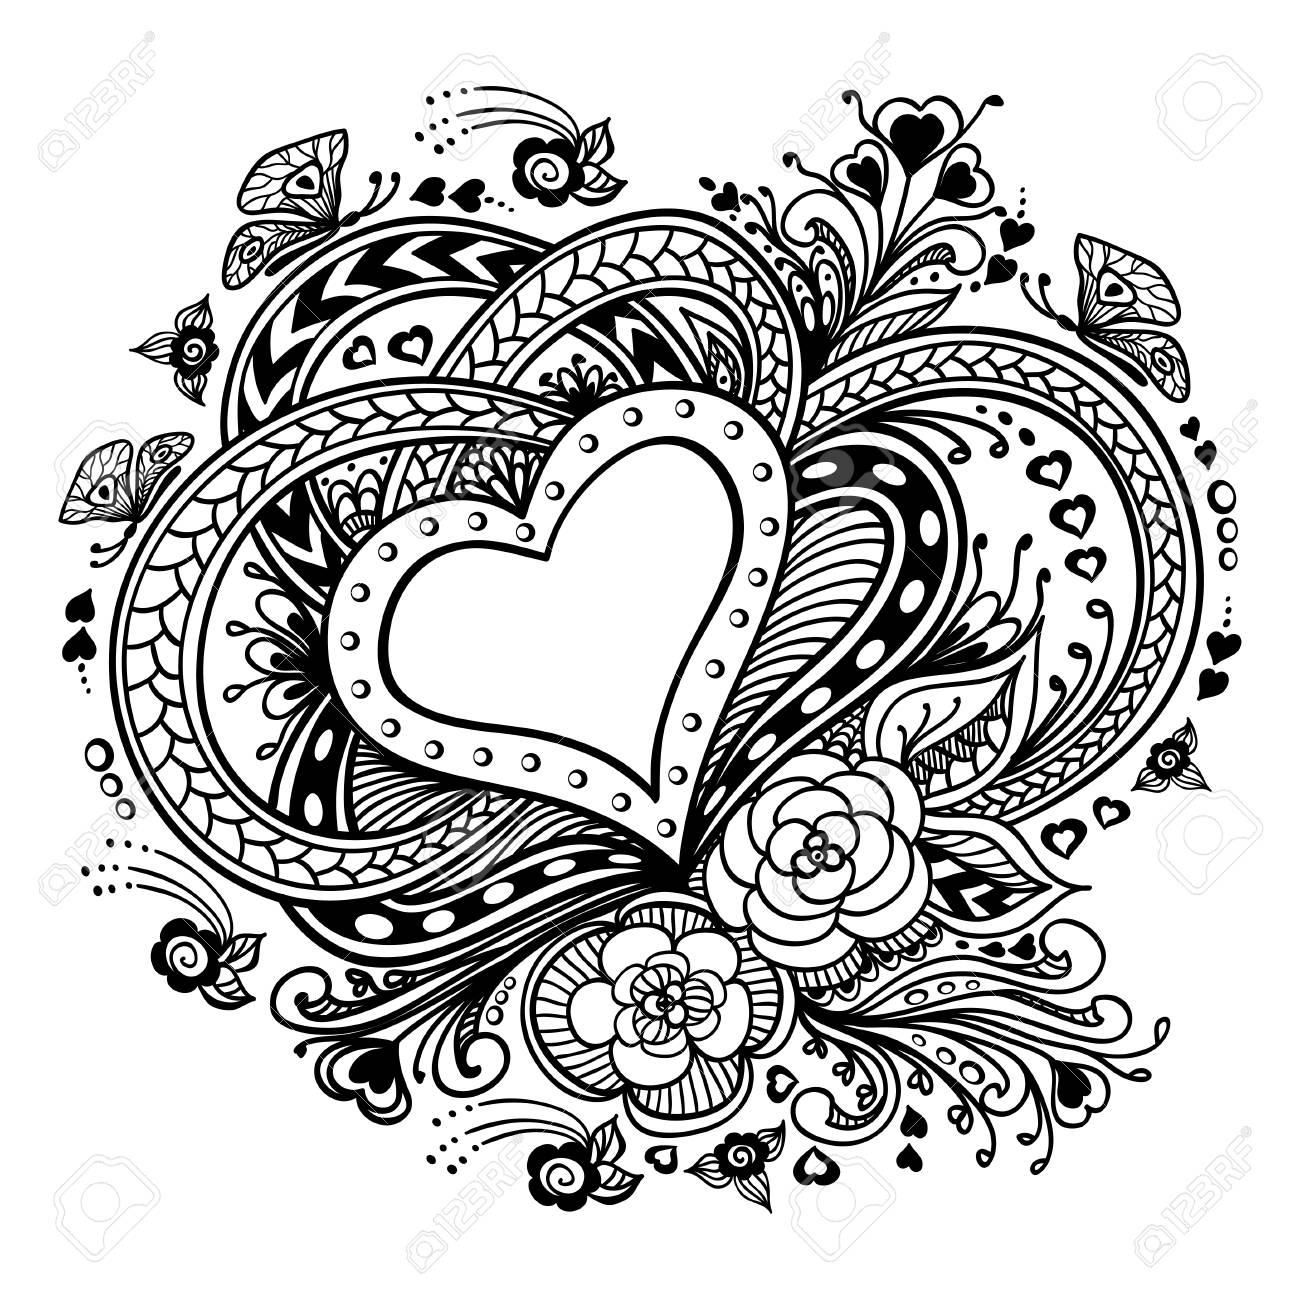 Zen-doodle Heart Frame With Flowers Butterflies Black On White ...